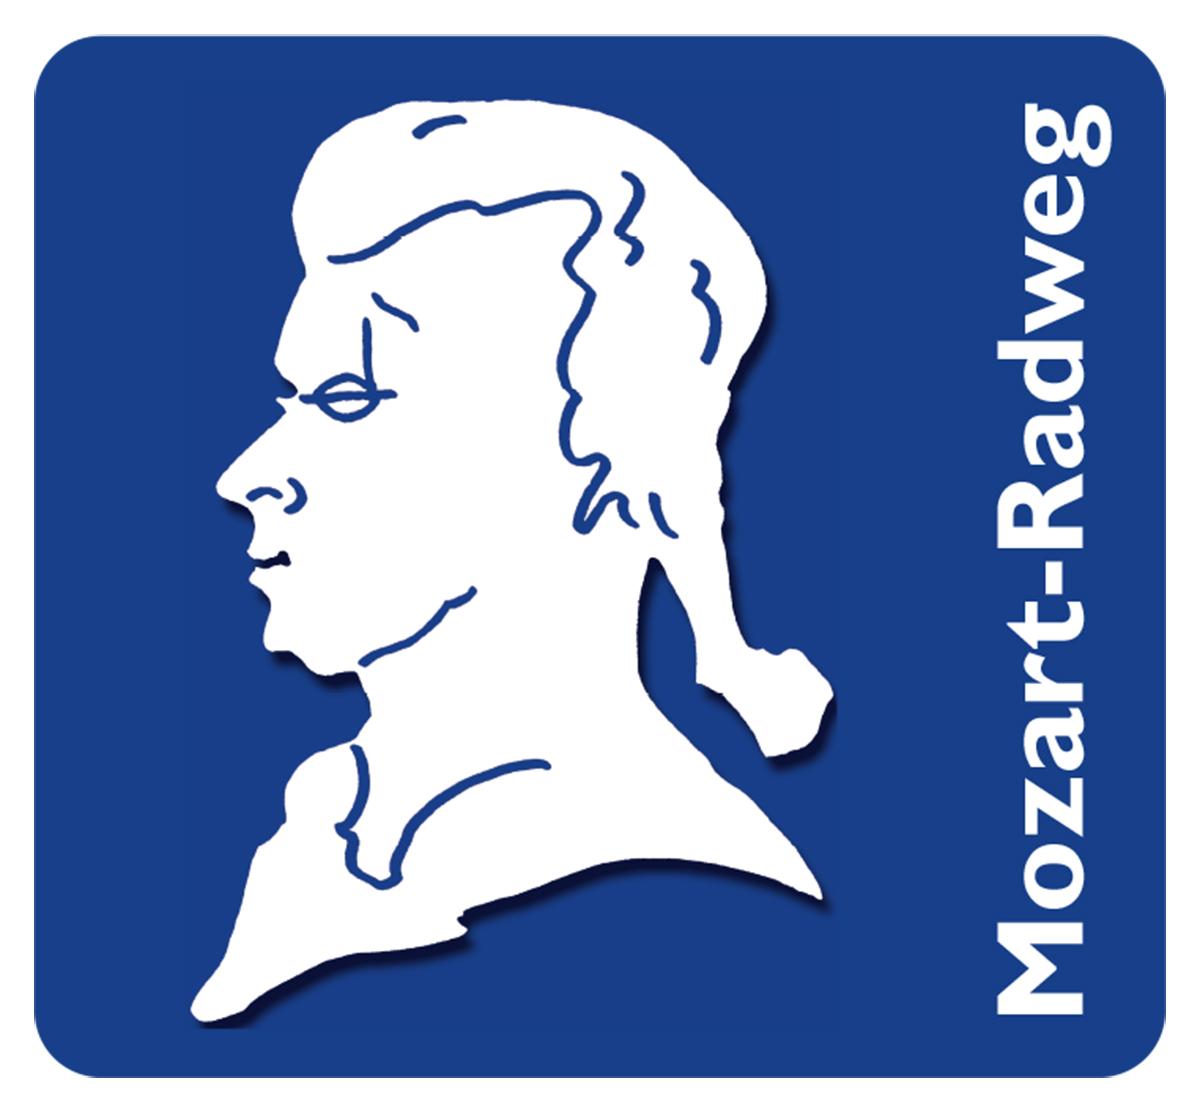 Mozartradweg